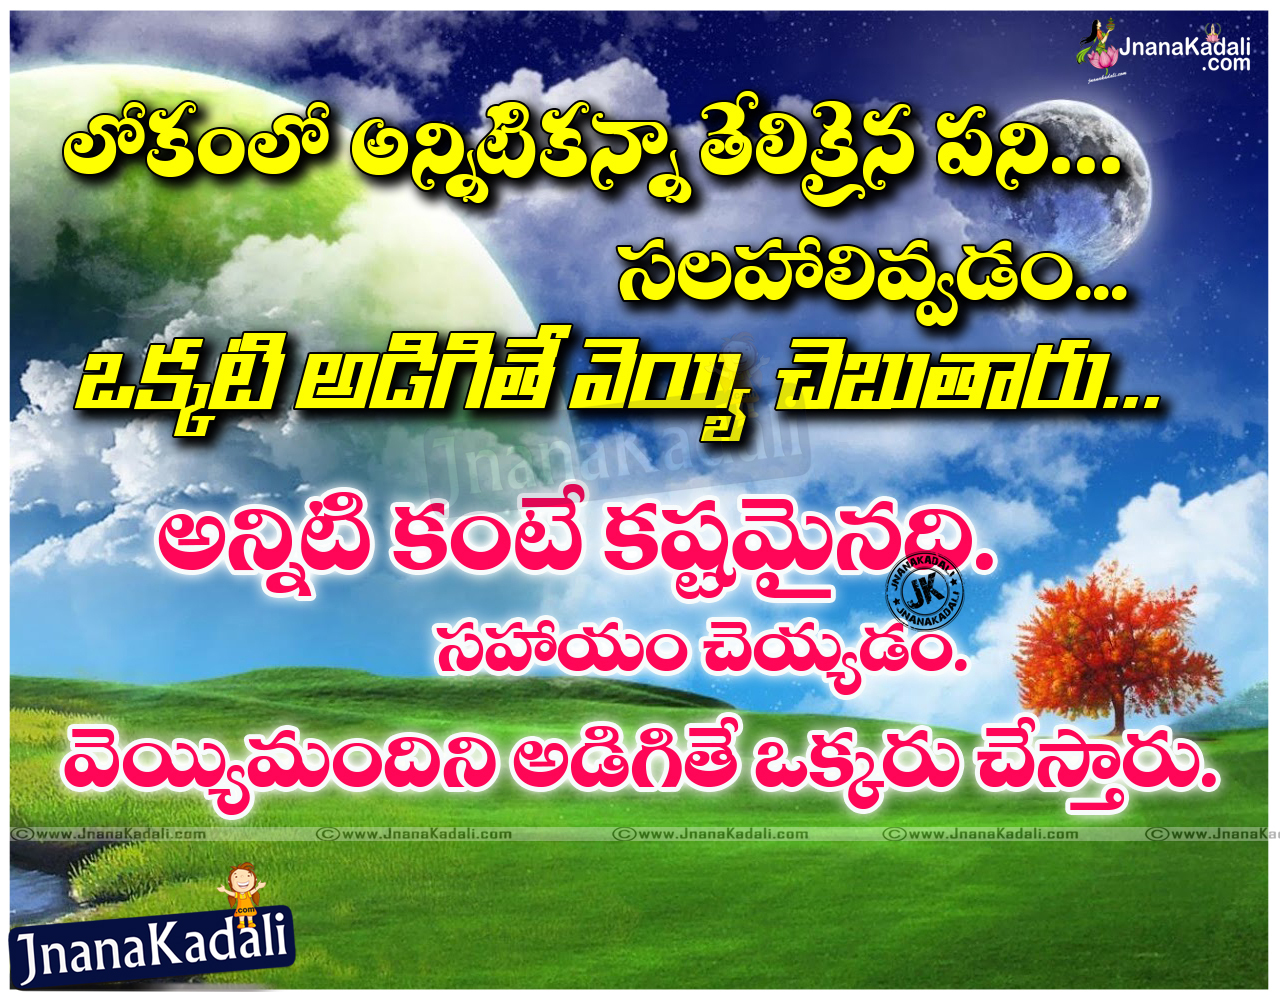 Best Telugu Success Life Quotes For Facebook Jnana Kadalicom